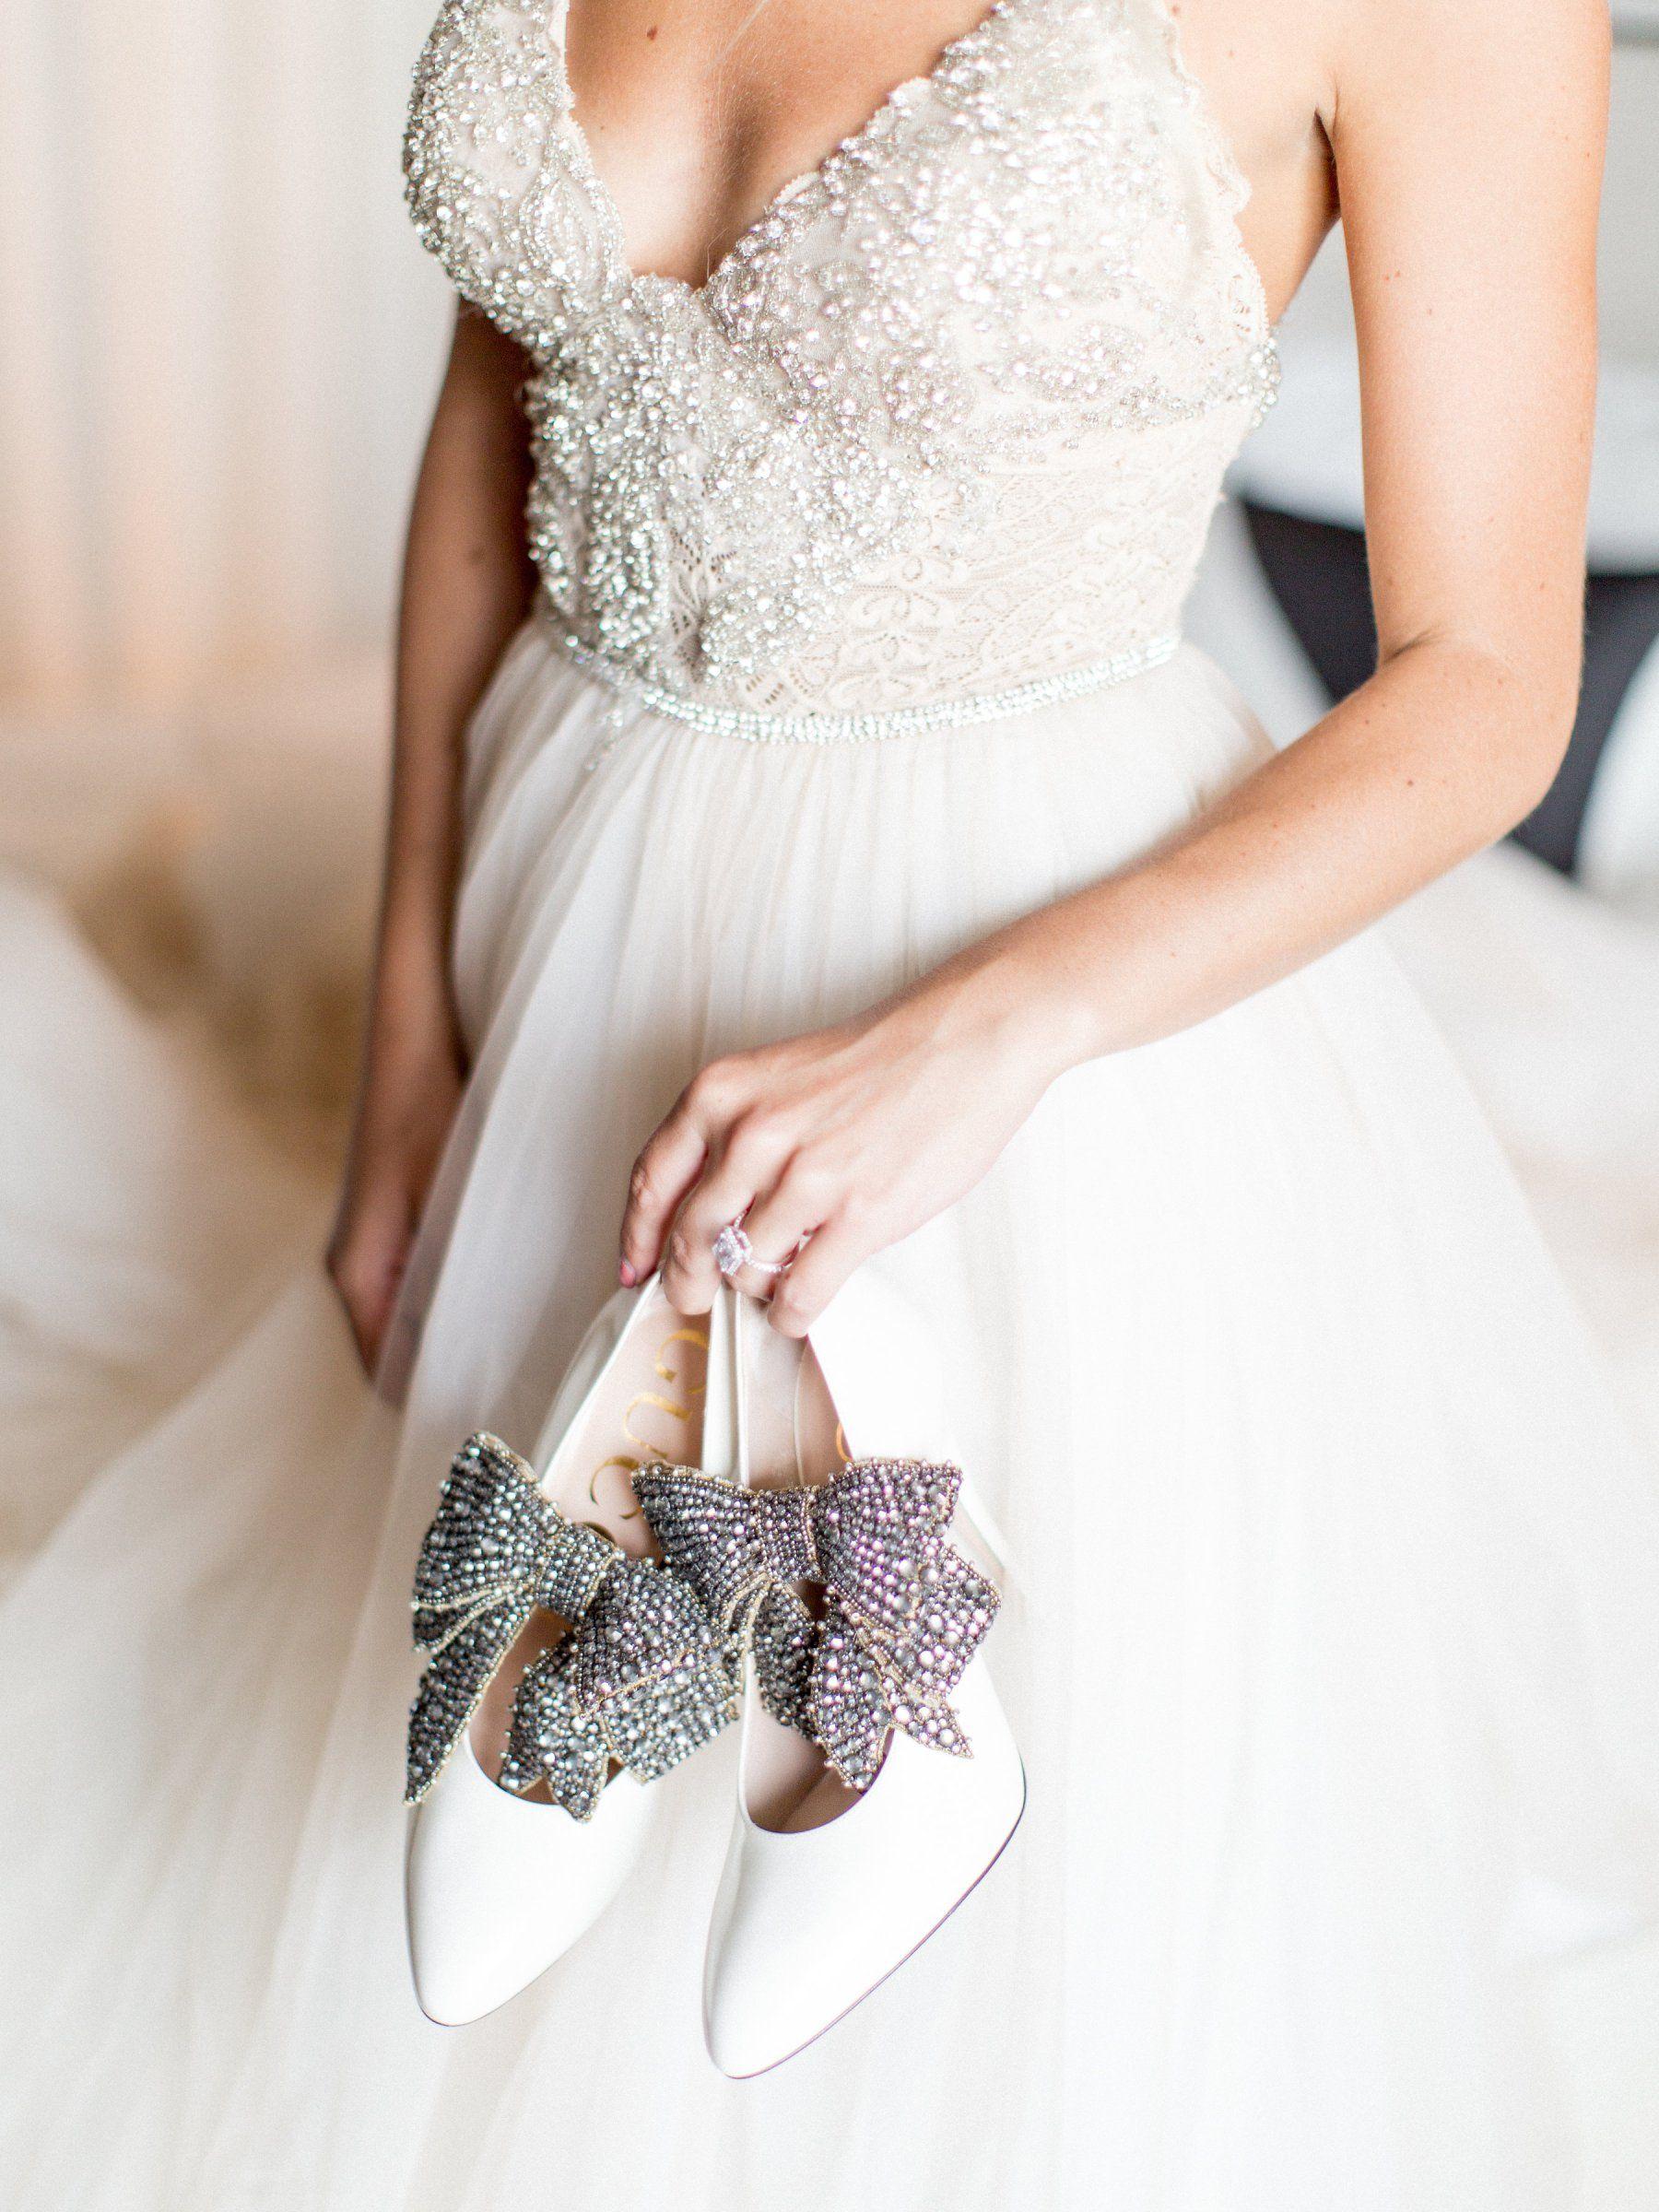 Wedding Shoes Bride 2018 Gucci Fashion